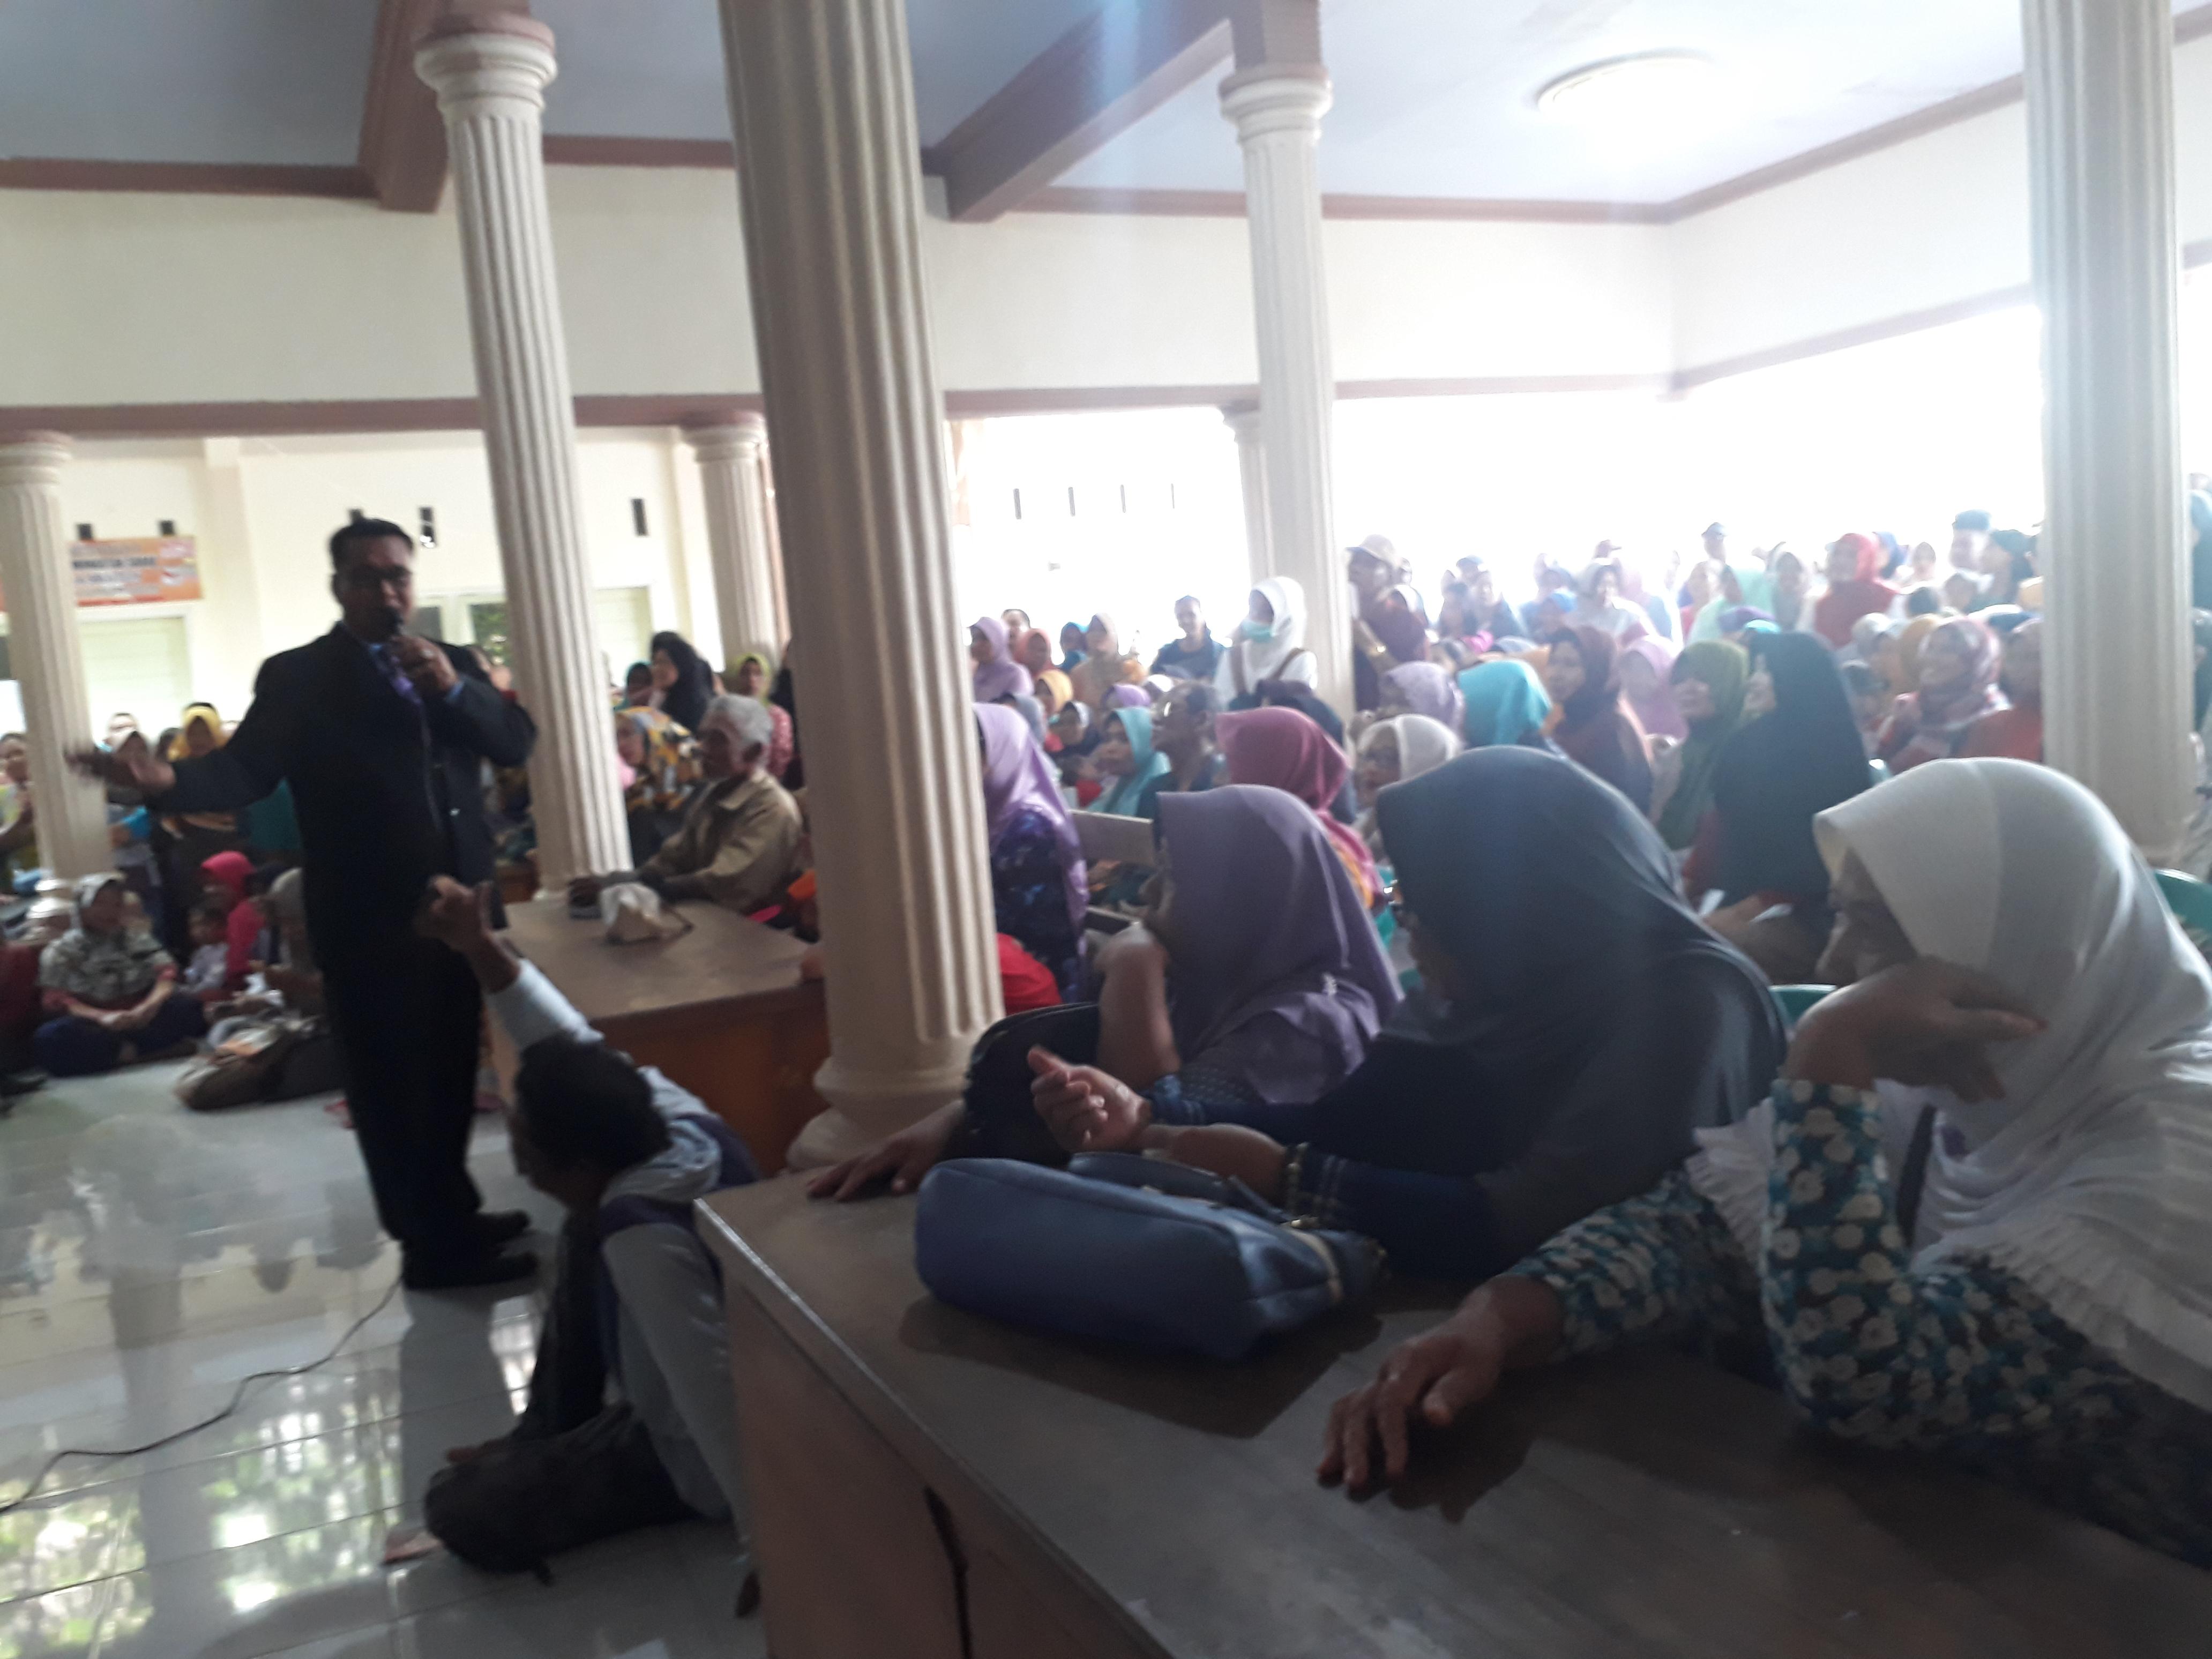 Dikabarkan Bangkrut, Ratusan Anggota KUD Trijaya Tagih Uang Tabungannya